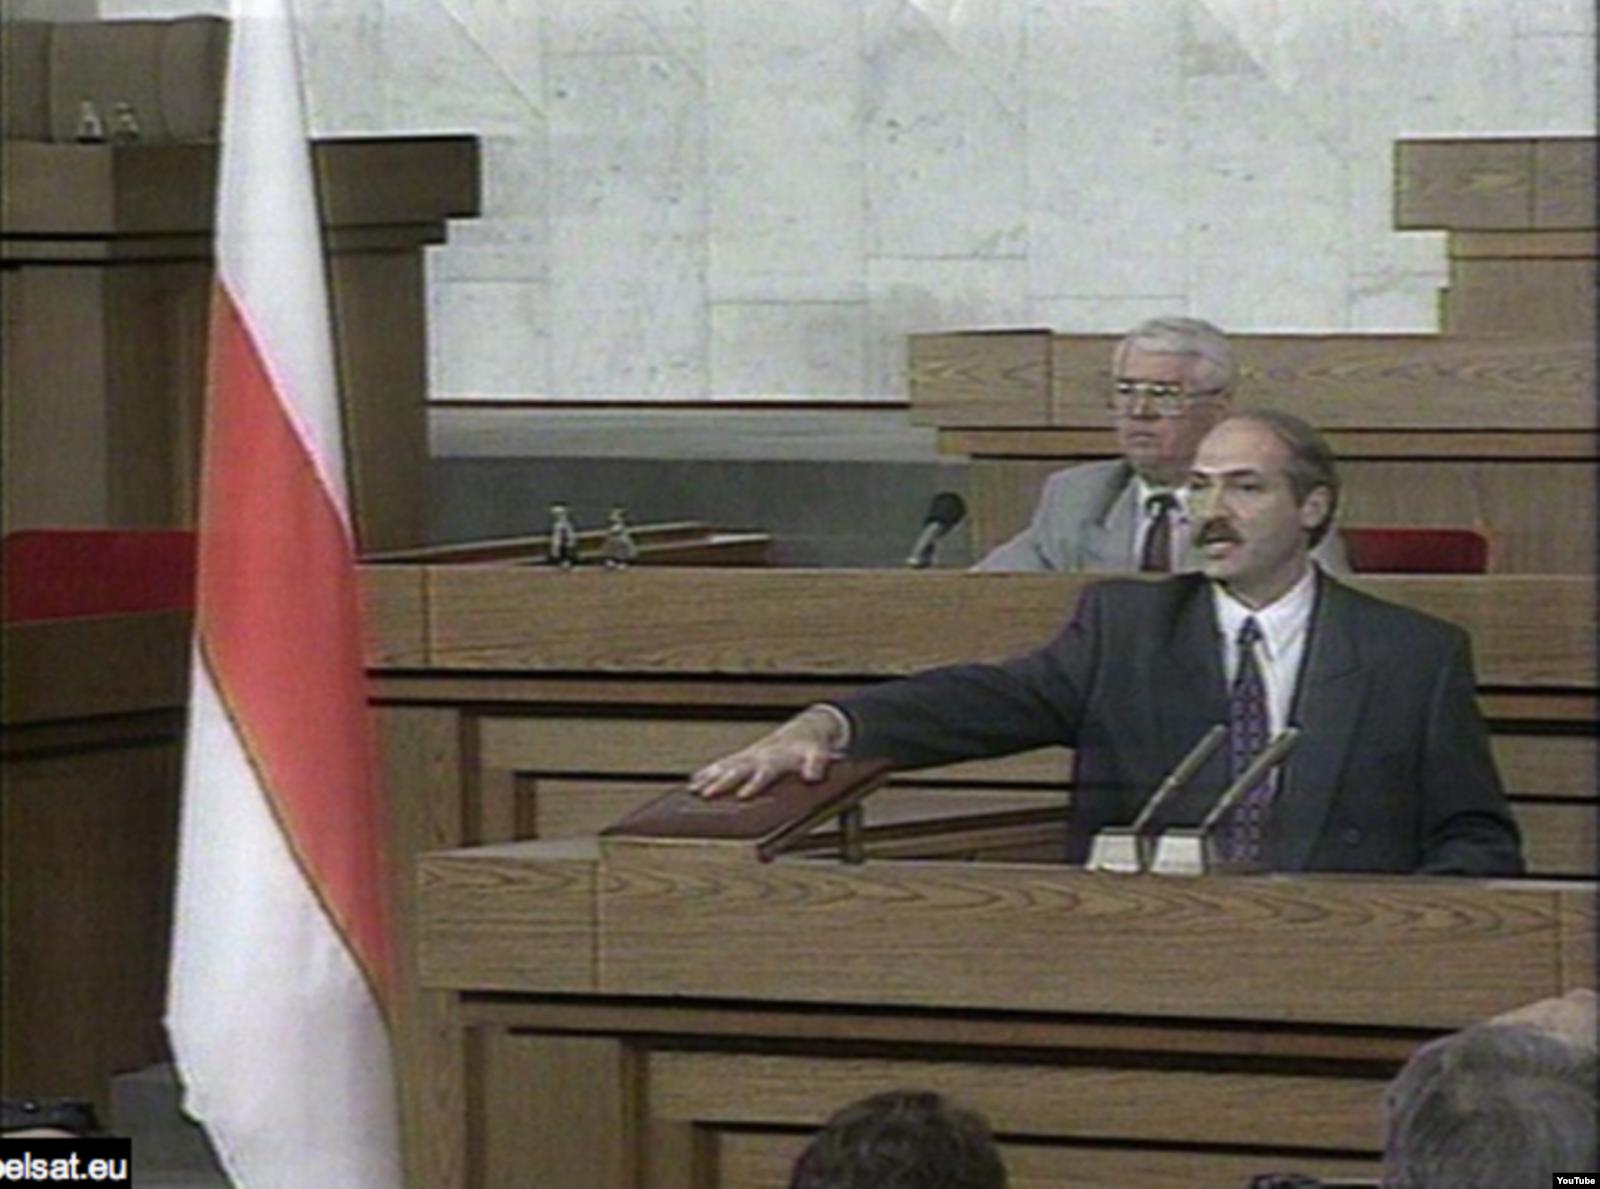 Александр Лукашенко приносит присягу в 1994 году. Фото: Video grab